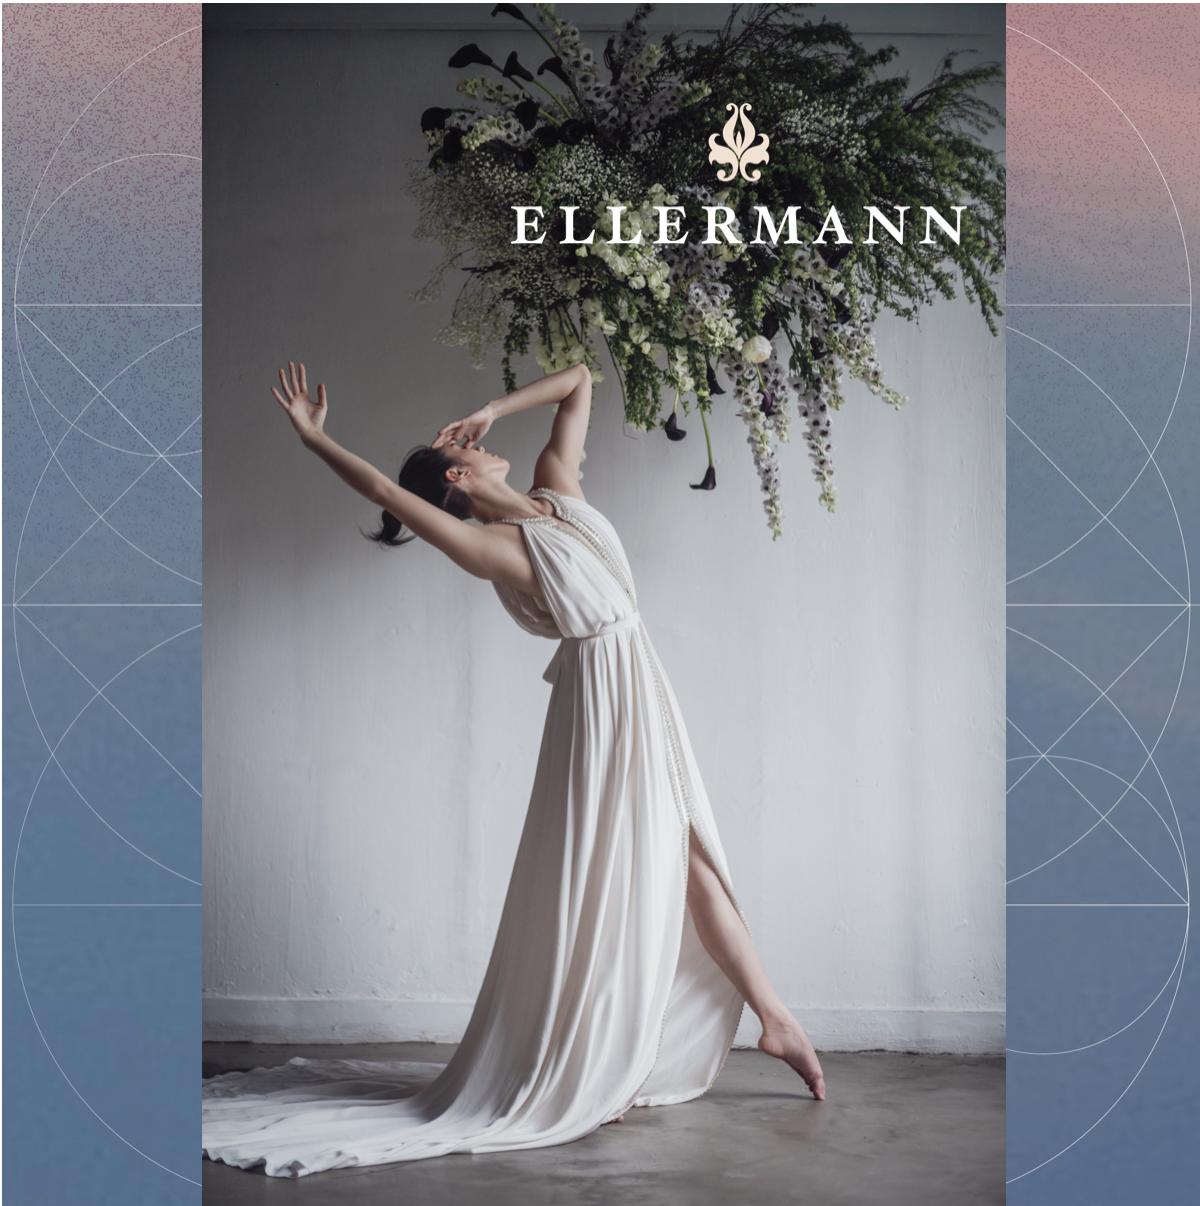 ELLERMANN - THE WAY SHE MOVES -former ballet dancer and local entrepreneur Clare Lim.